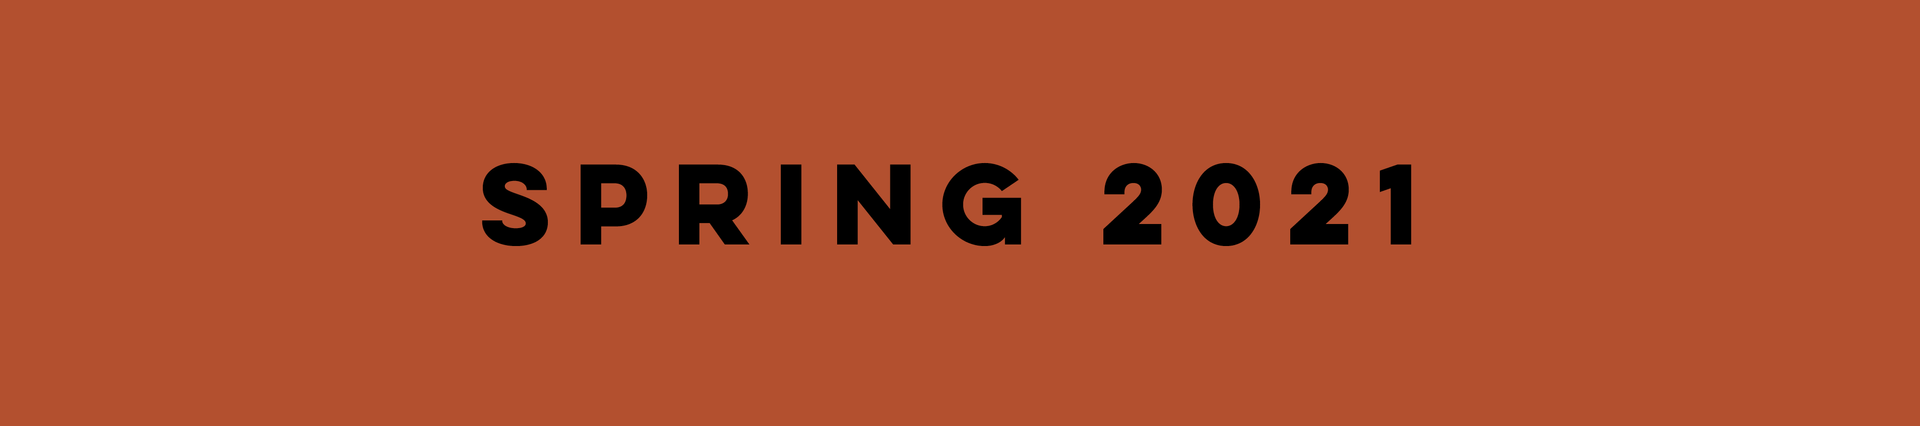 Seraphin Spring 2021